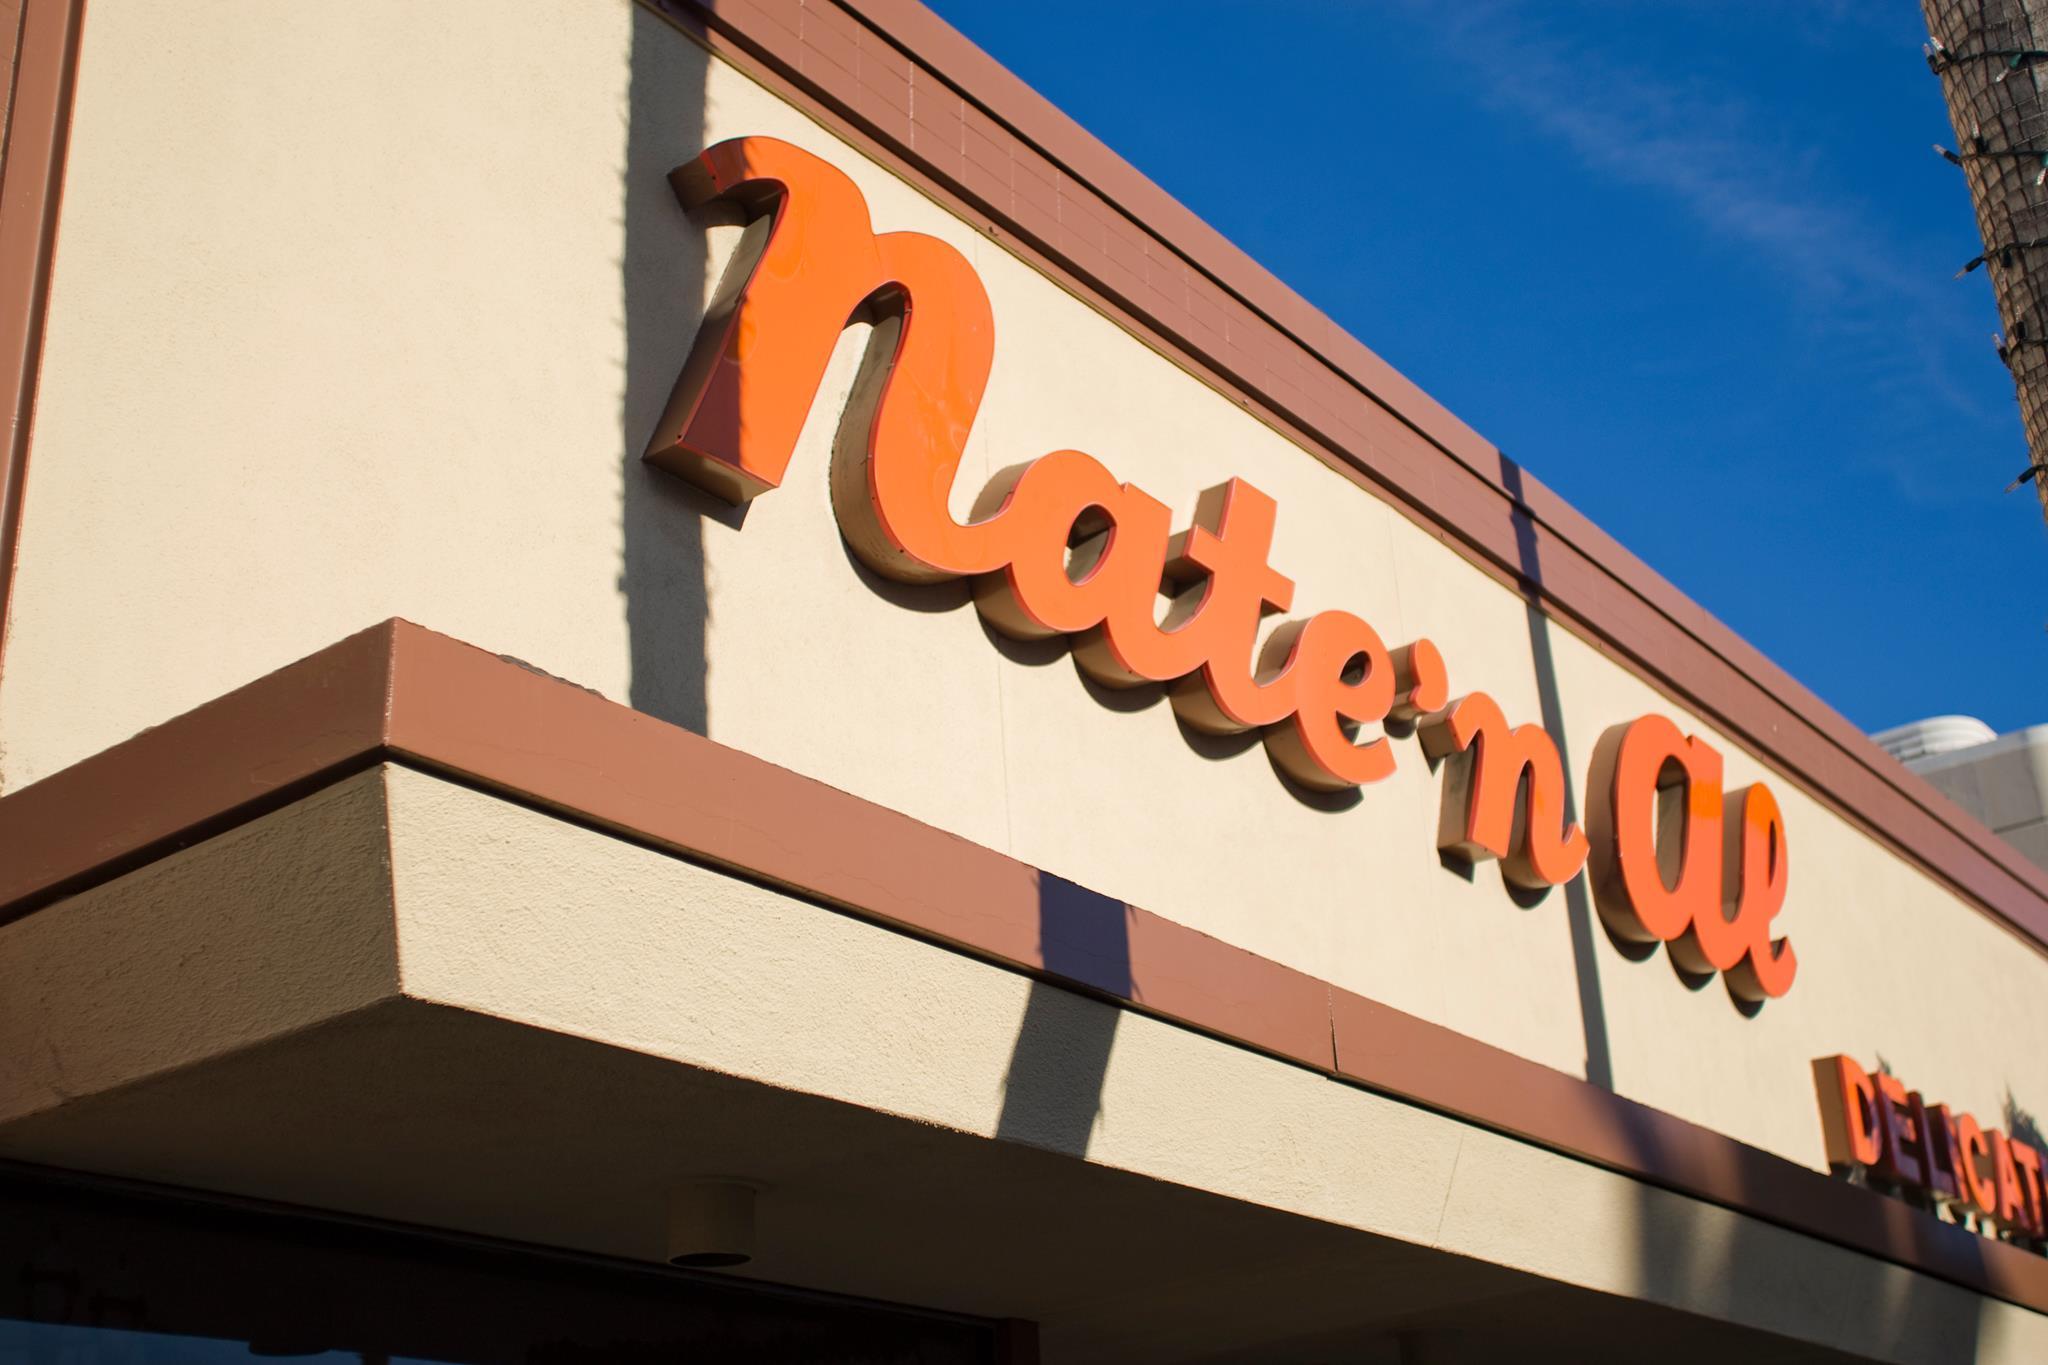 Nate N' Al Delicatessen signage in the sunlight.